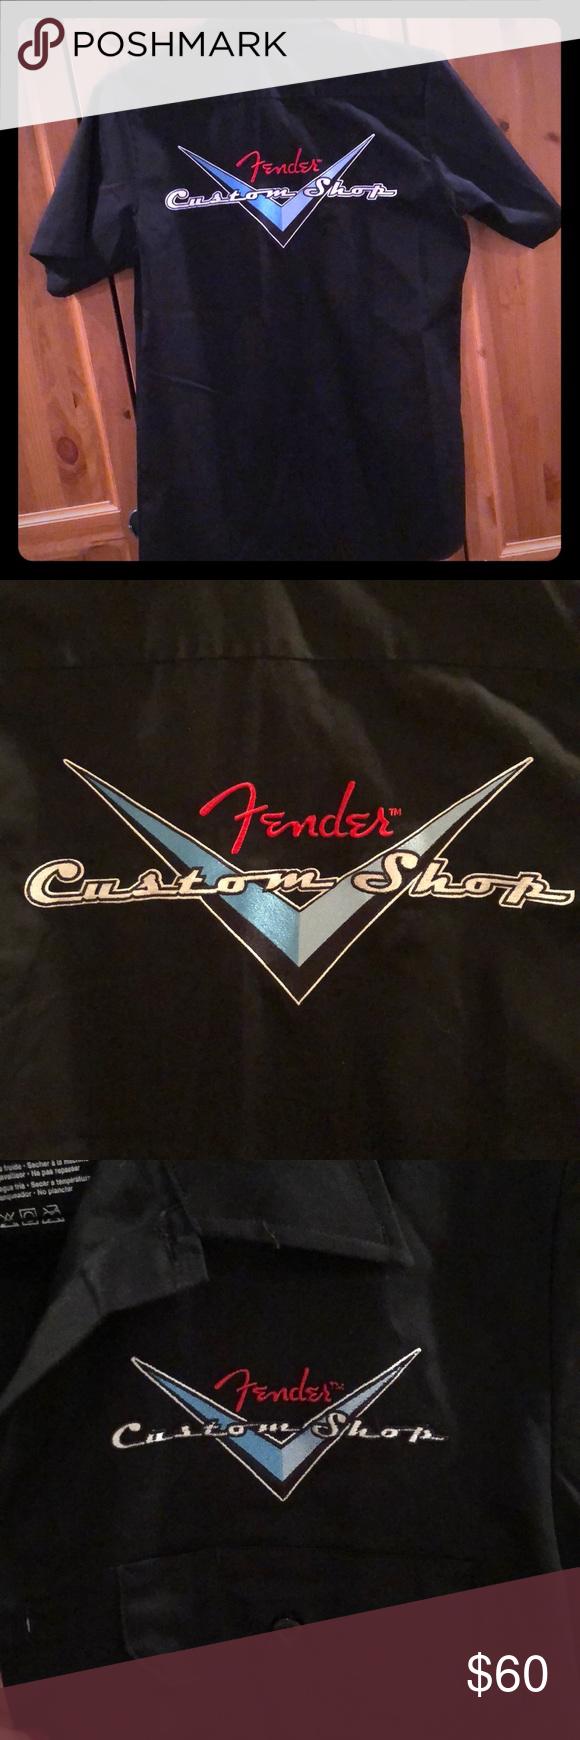 Closet Closing Fender Guitars Custom Shop Shirt How To Wear Shopping Shirt Shop